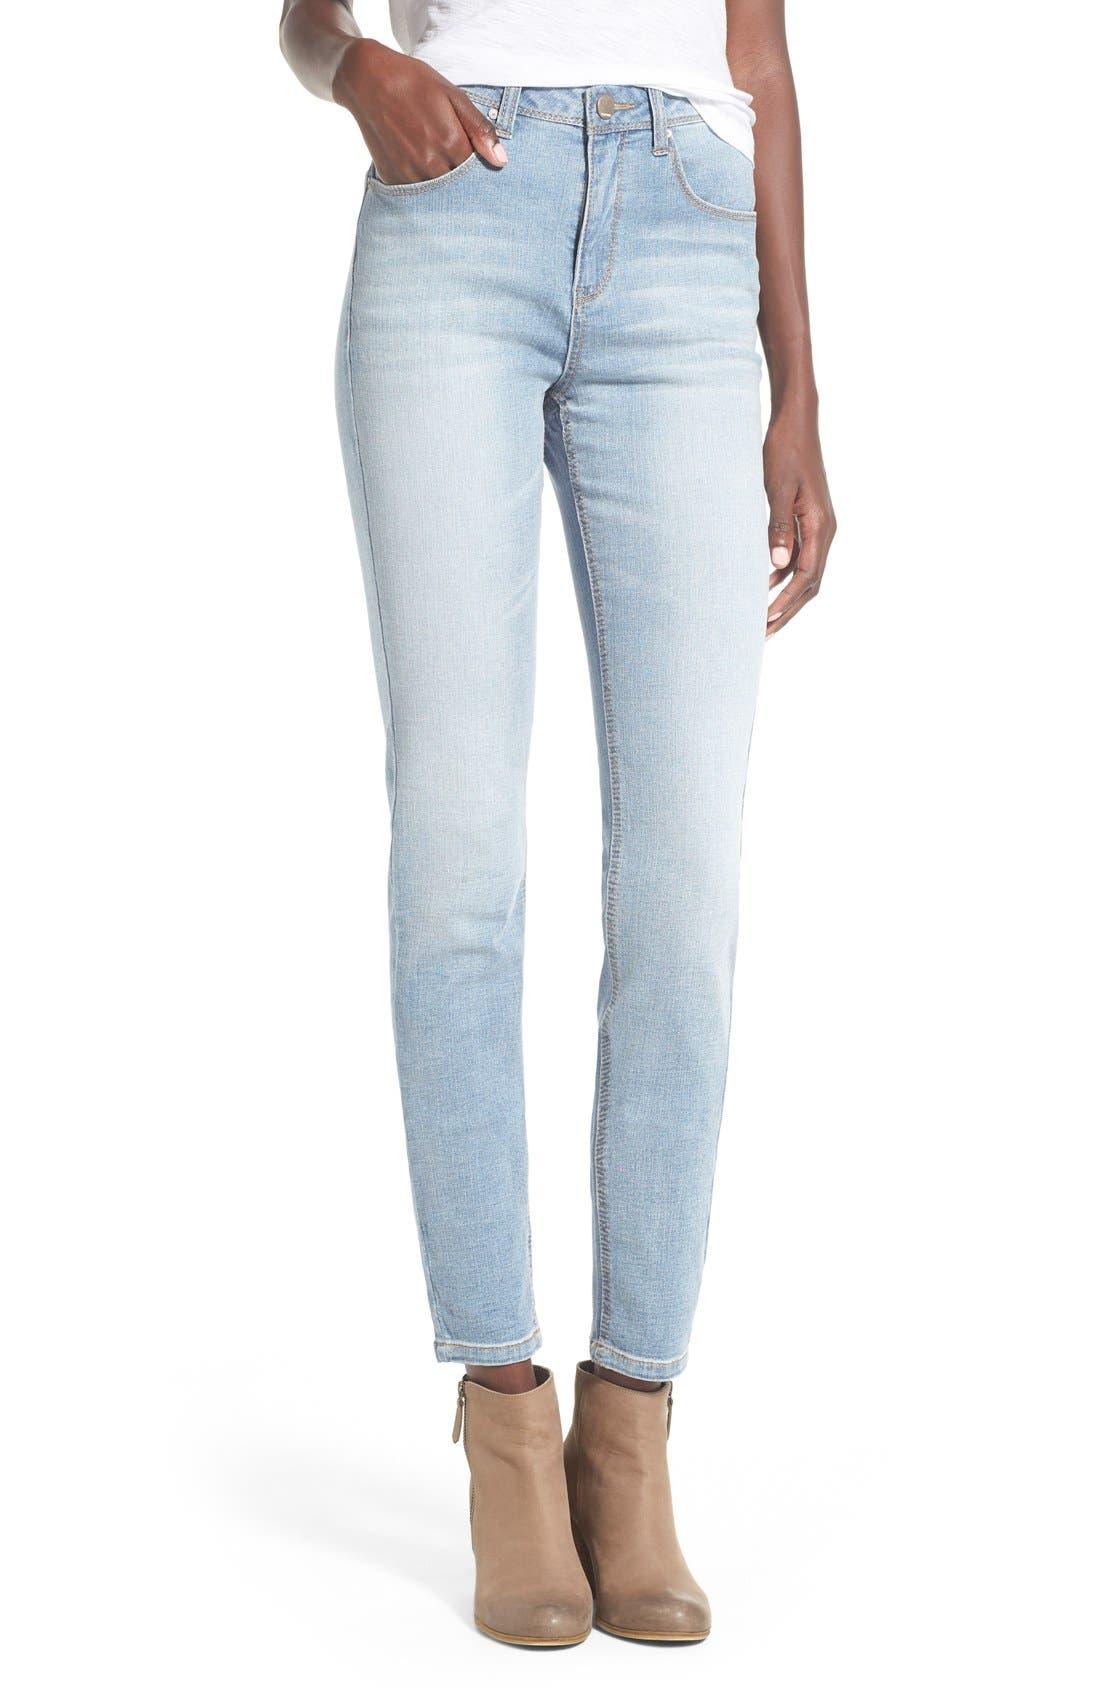 Alternate Image 1 Selected - Generra High Waist Skinny Jeans (Mastic)